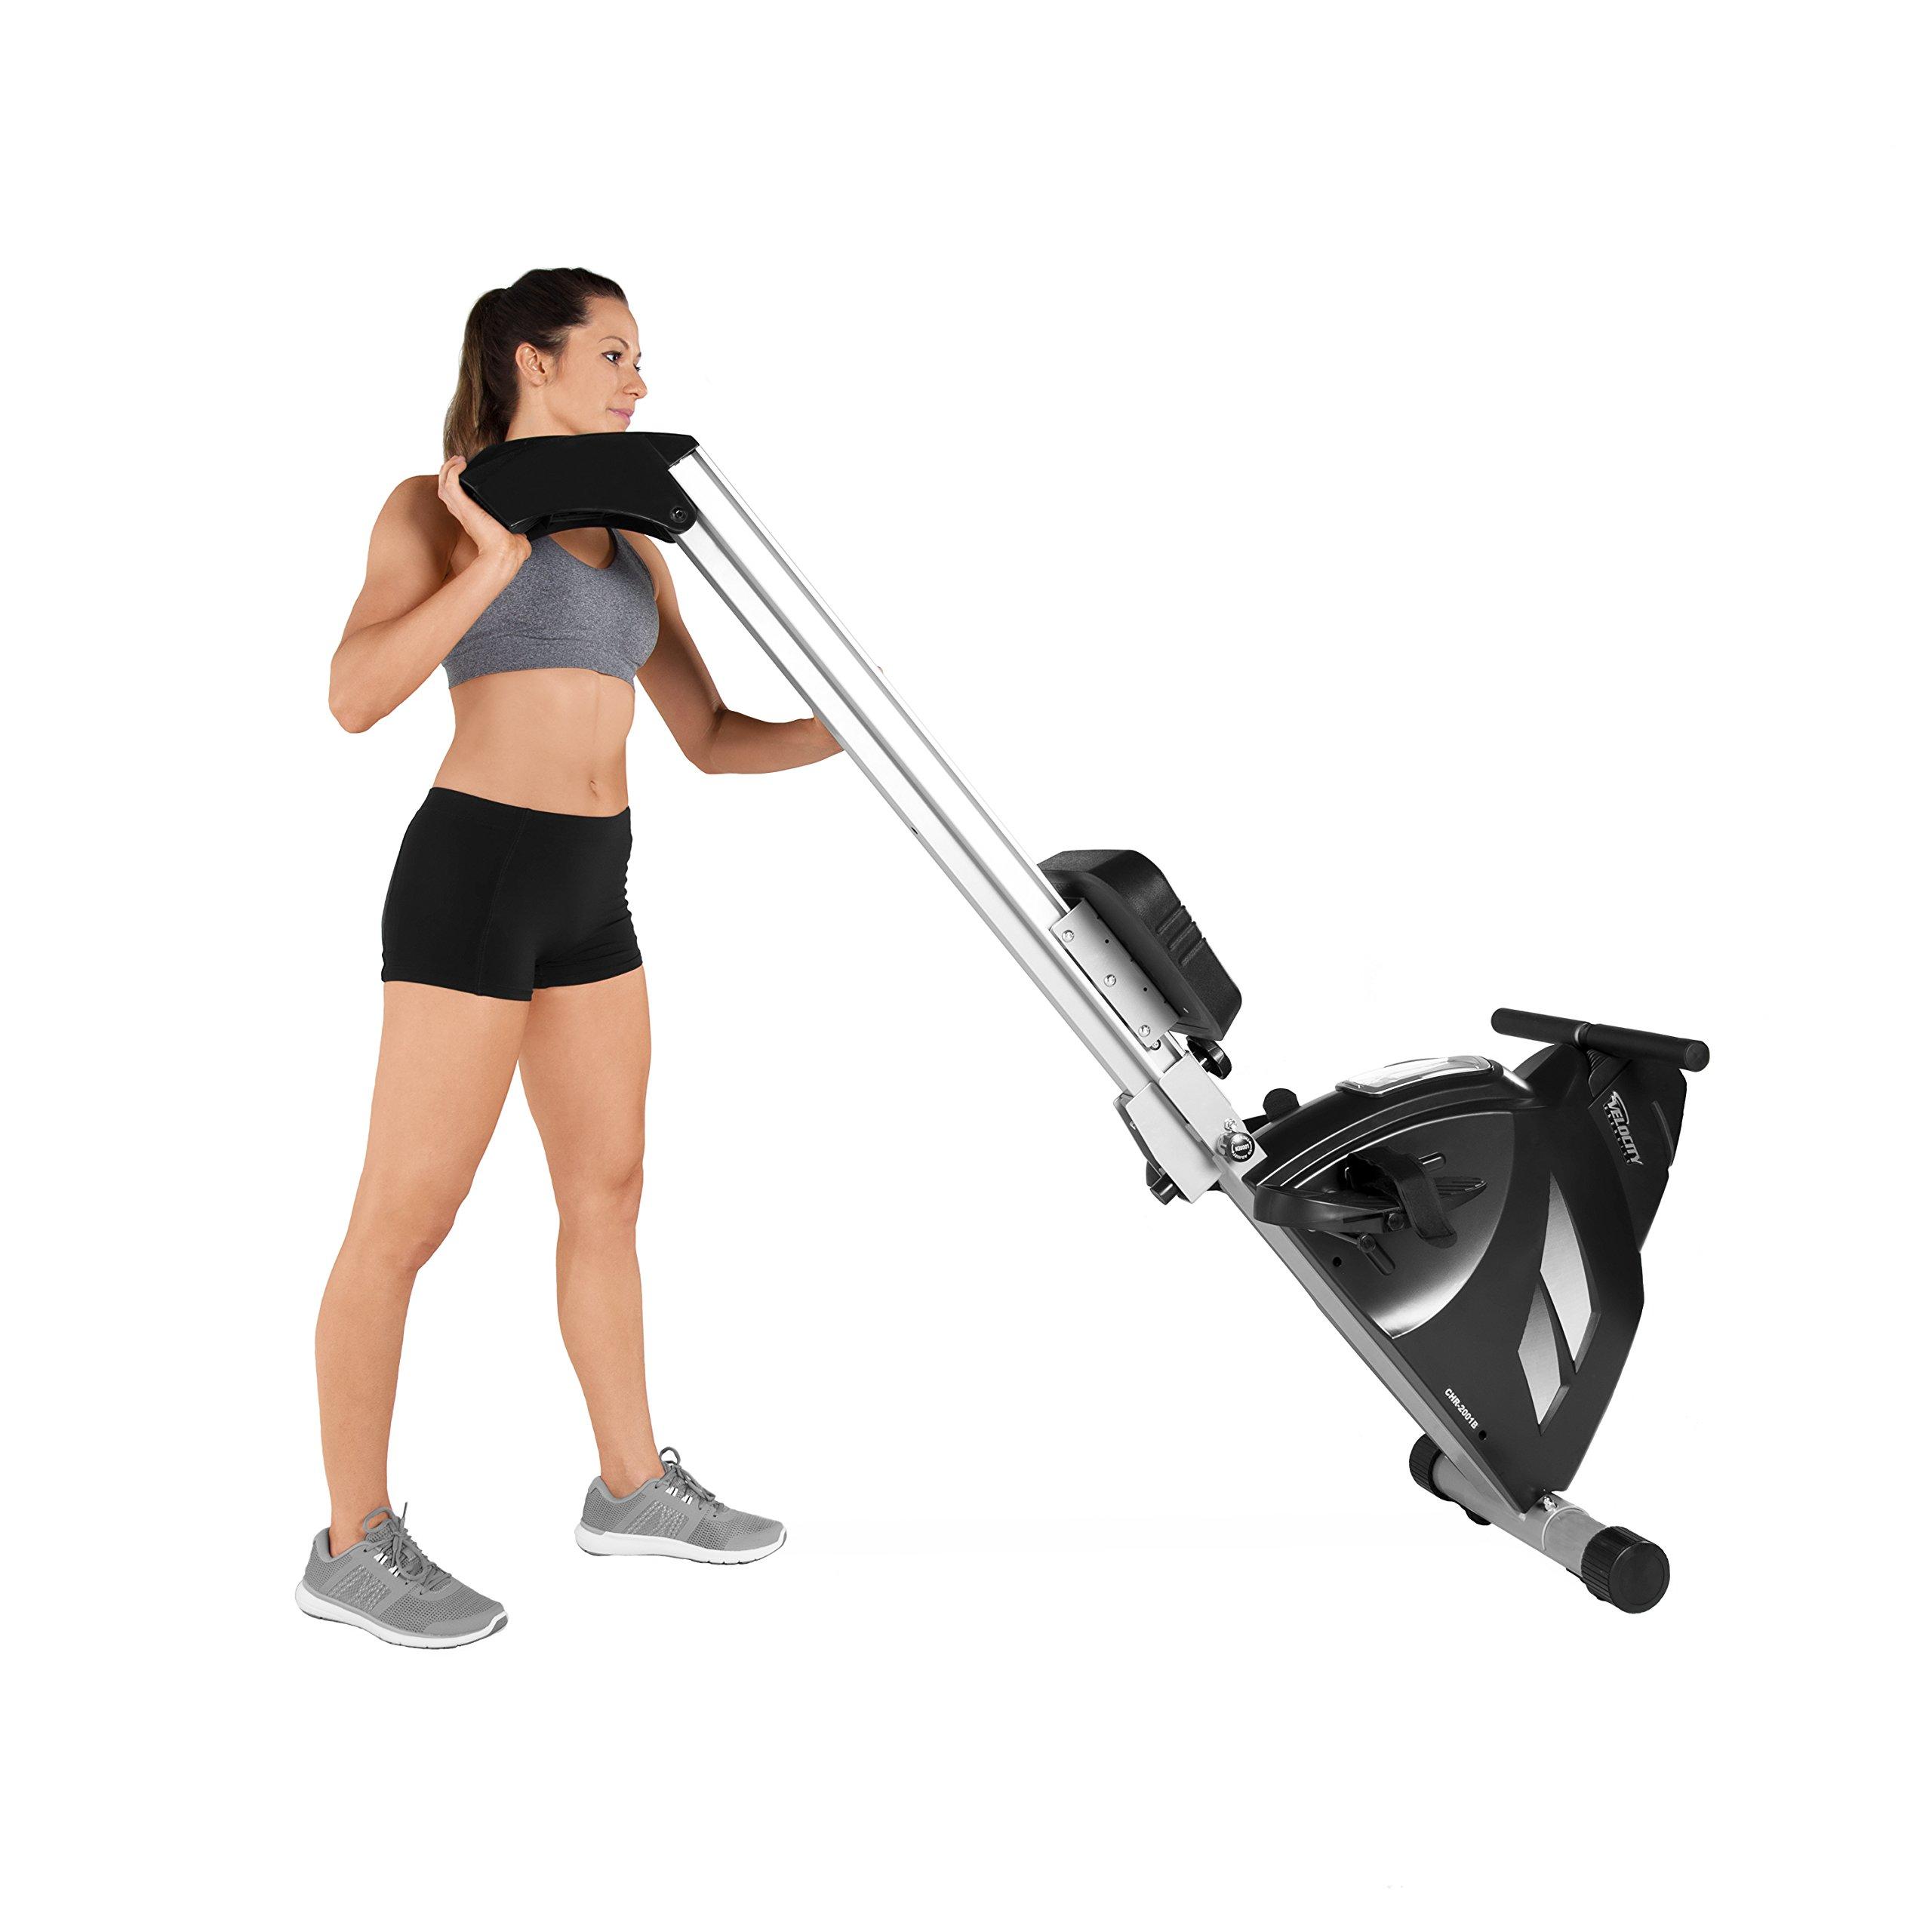 Velocity Exercise Magnetic Rower, Black by velocityexercise (Image #6)